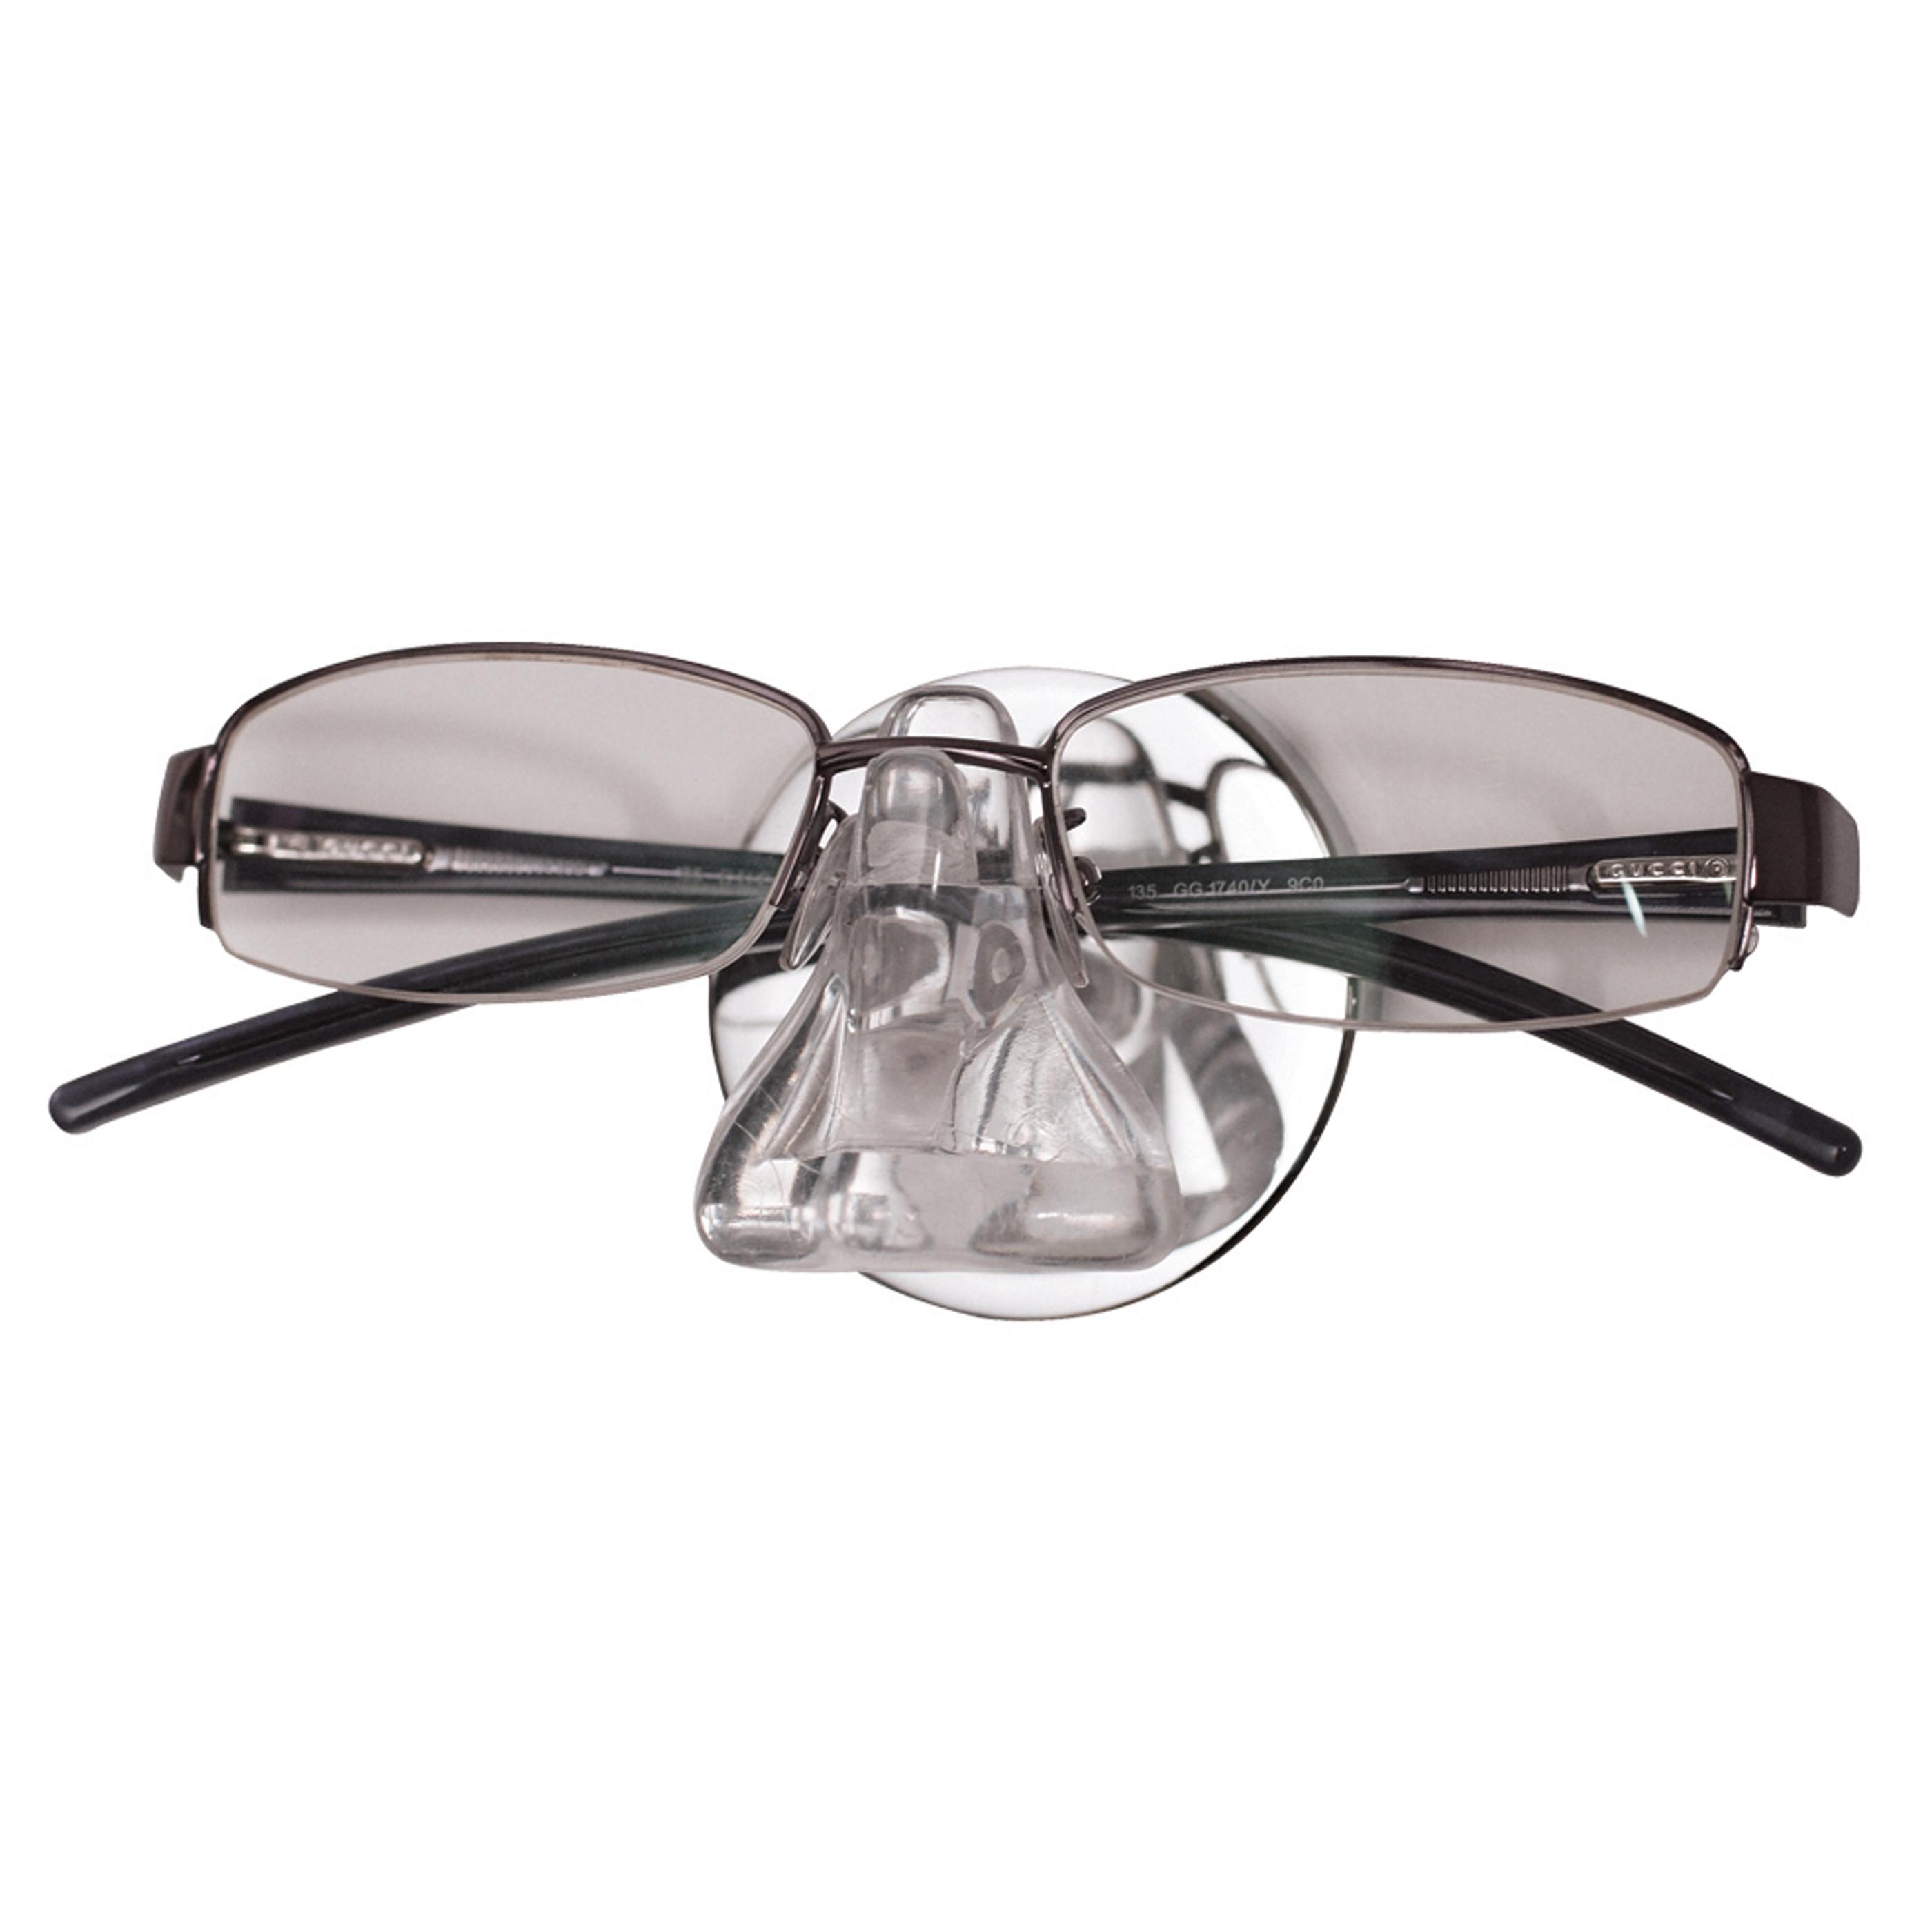 Glasögonhållare Round INVISIBLE Klarplast Polerat stål, dolt sugproppsfäste Bosign